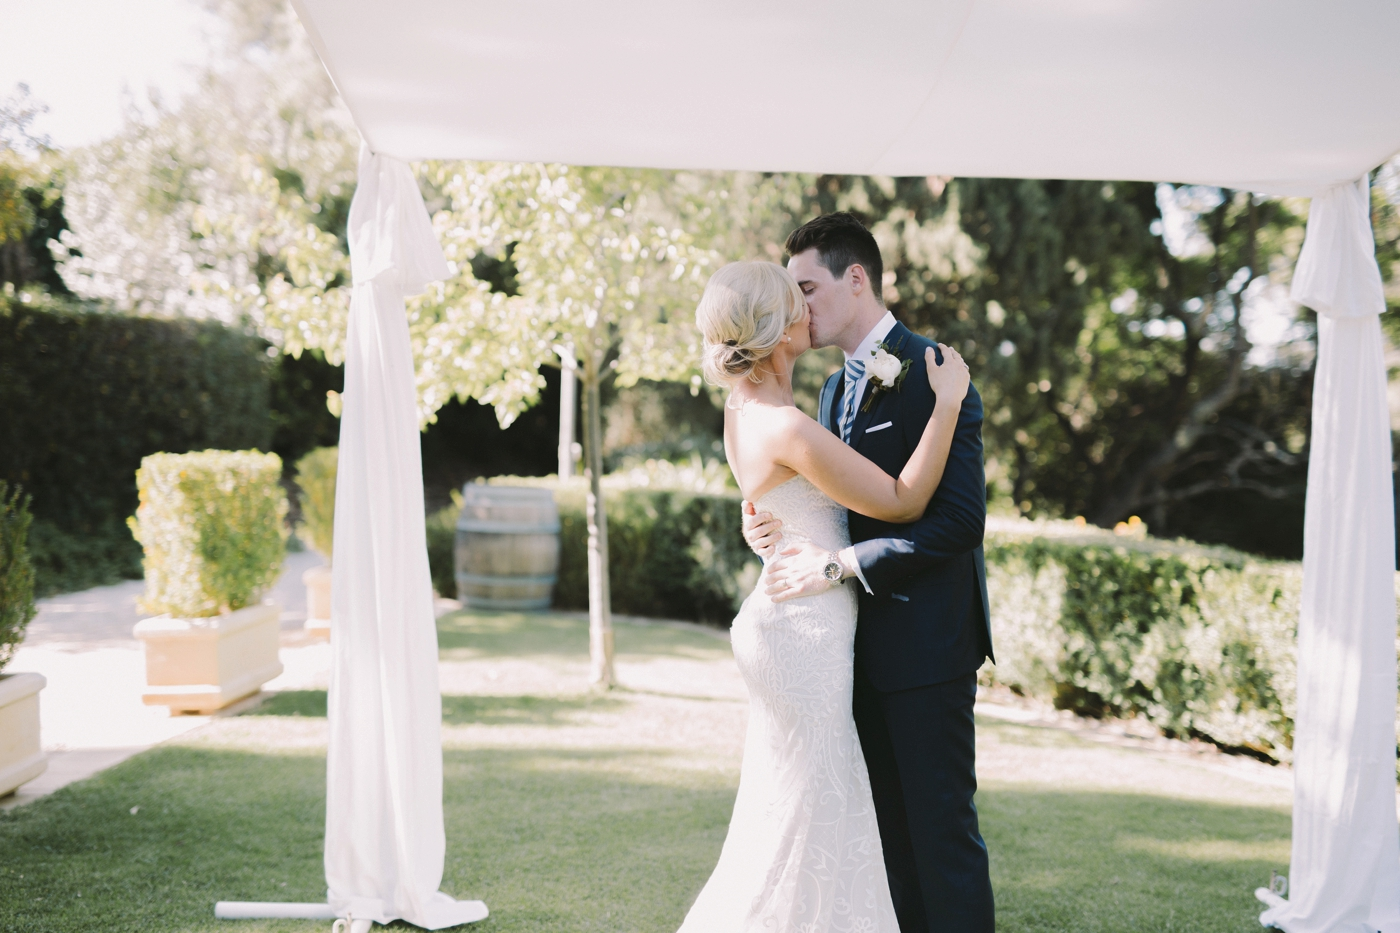 Lauren & Max - Marybank Estate Wedding - Natural wedding photographer in Adelaide - www.katherineschultzphotography.com 68